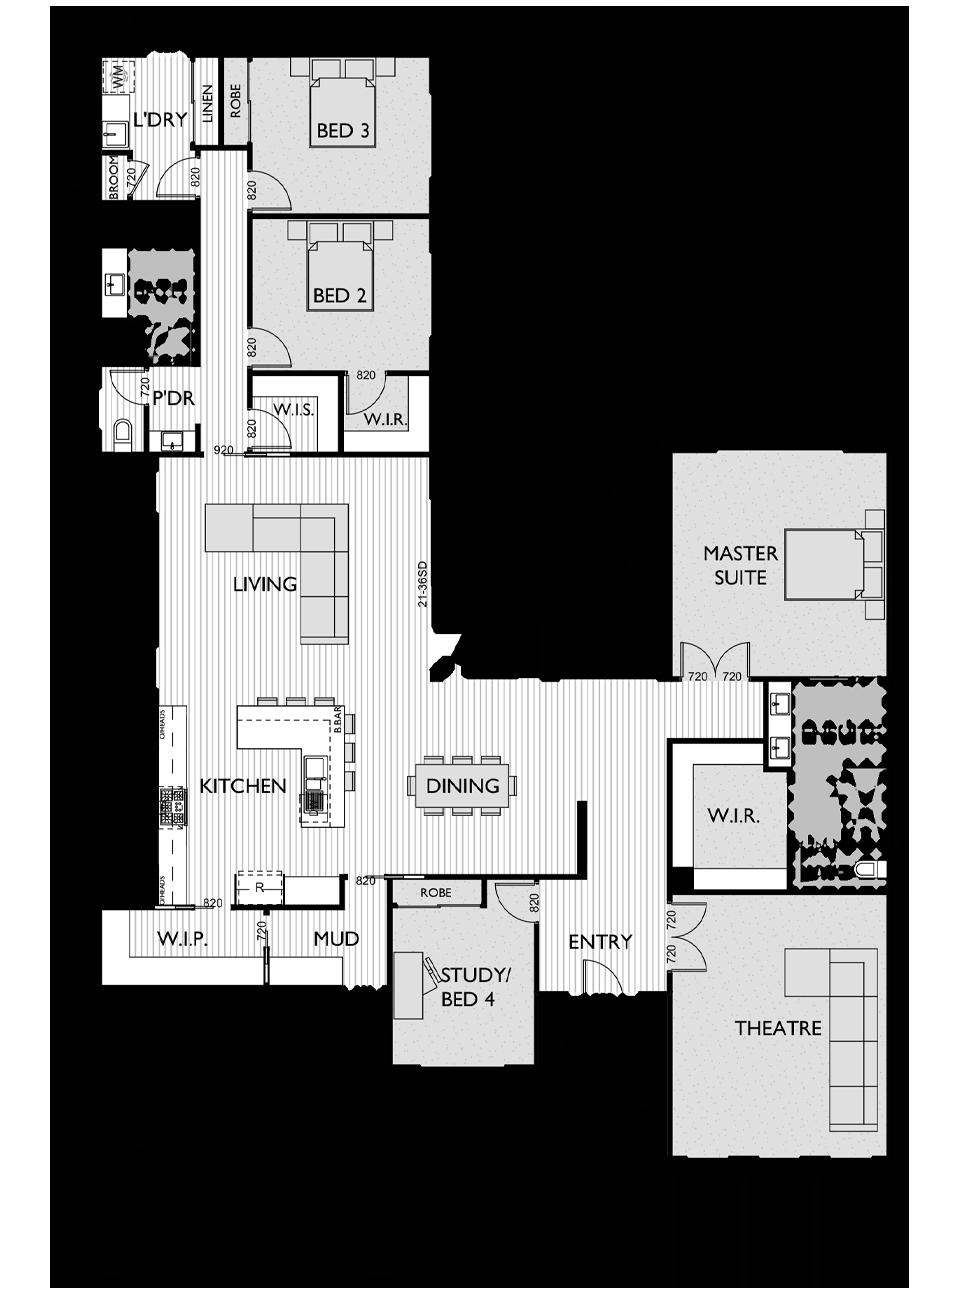 Floor Plan for Virtue Homes Malibu 34 family home